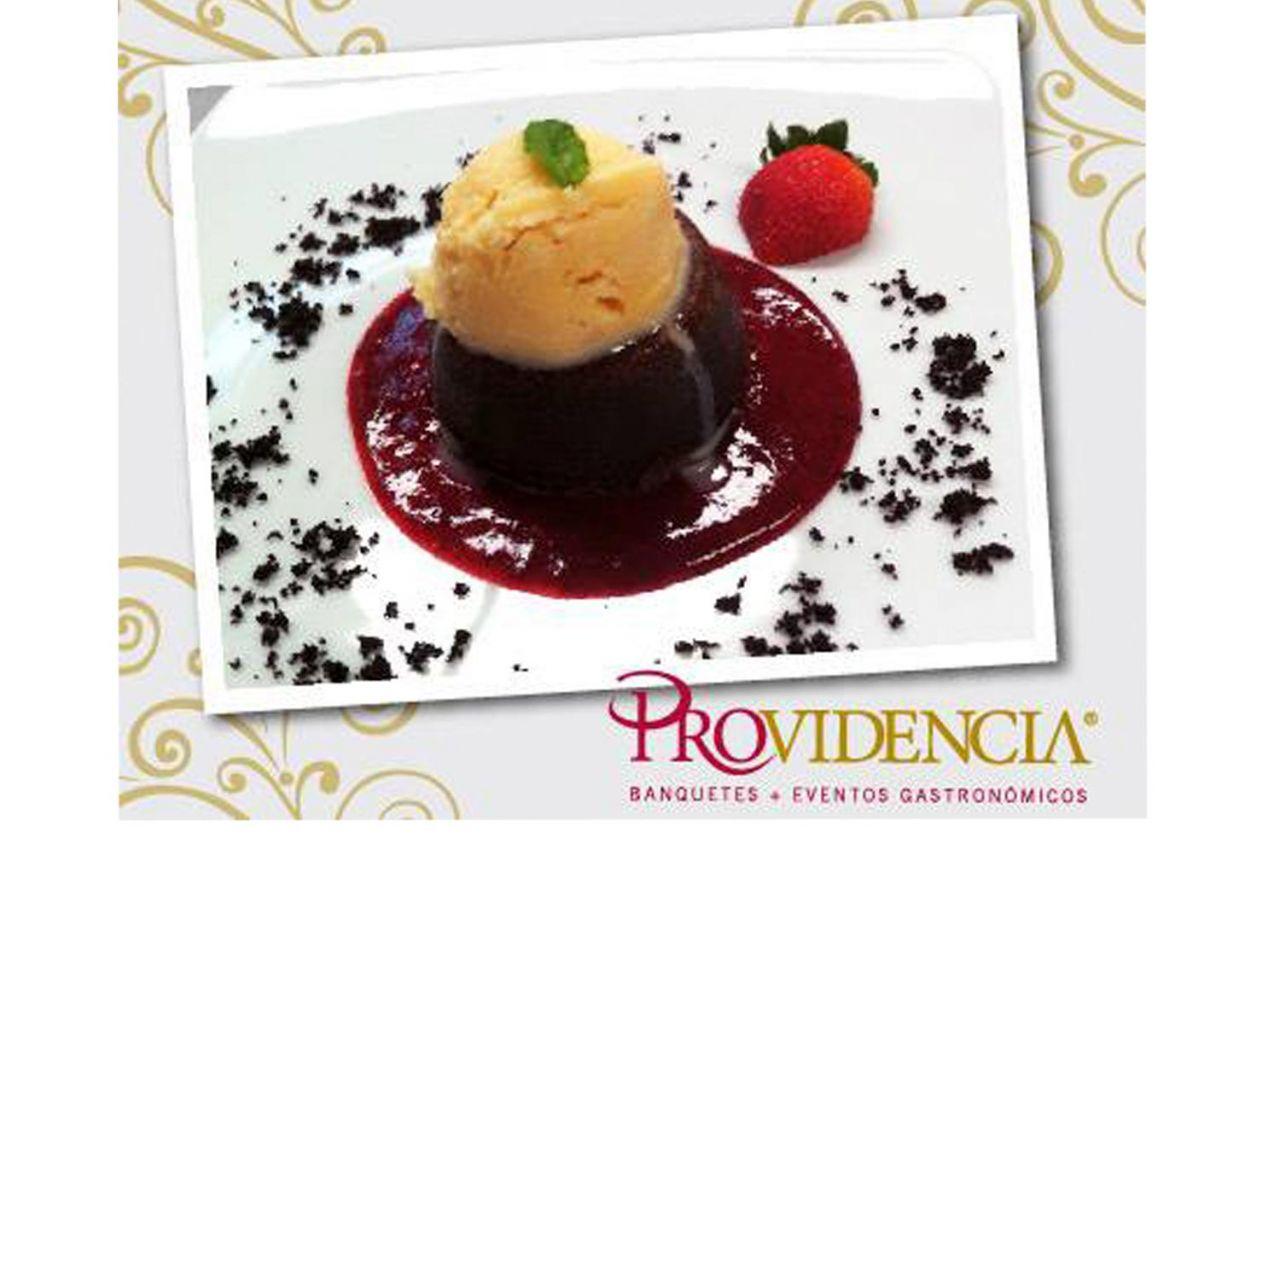 Banquetes Providencia - LaPlanner